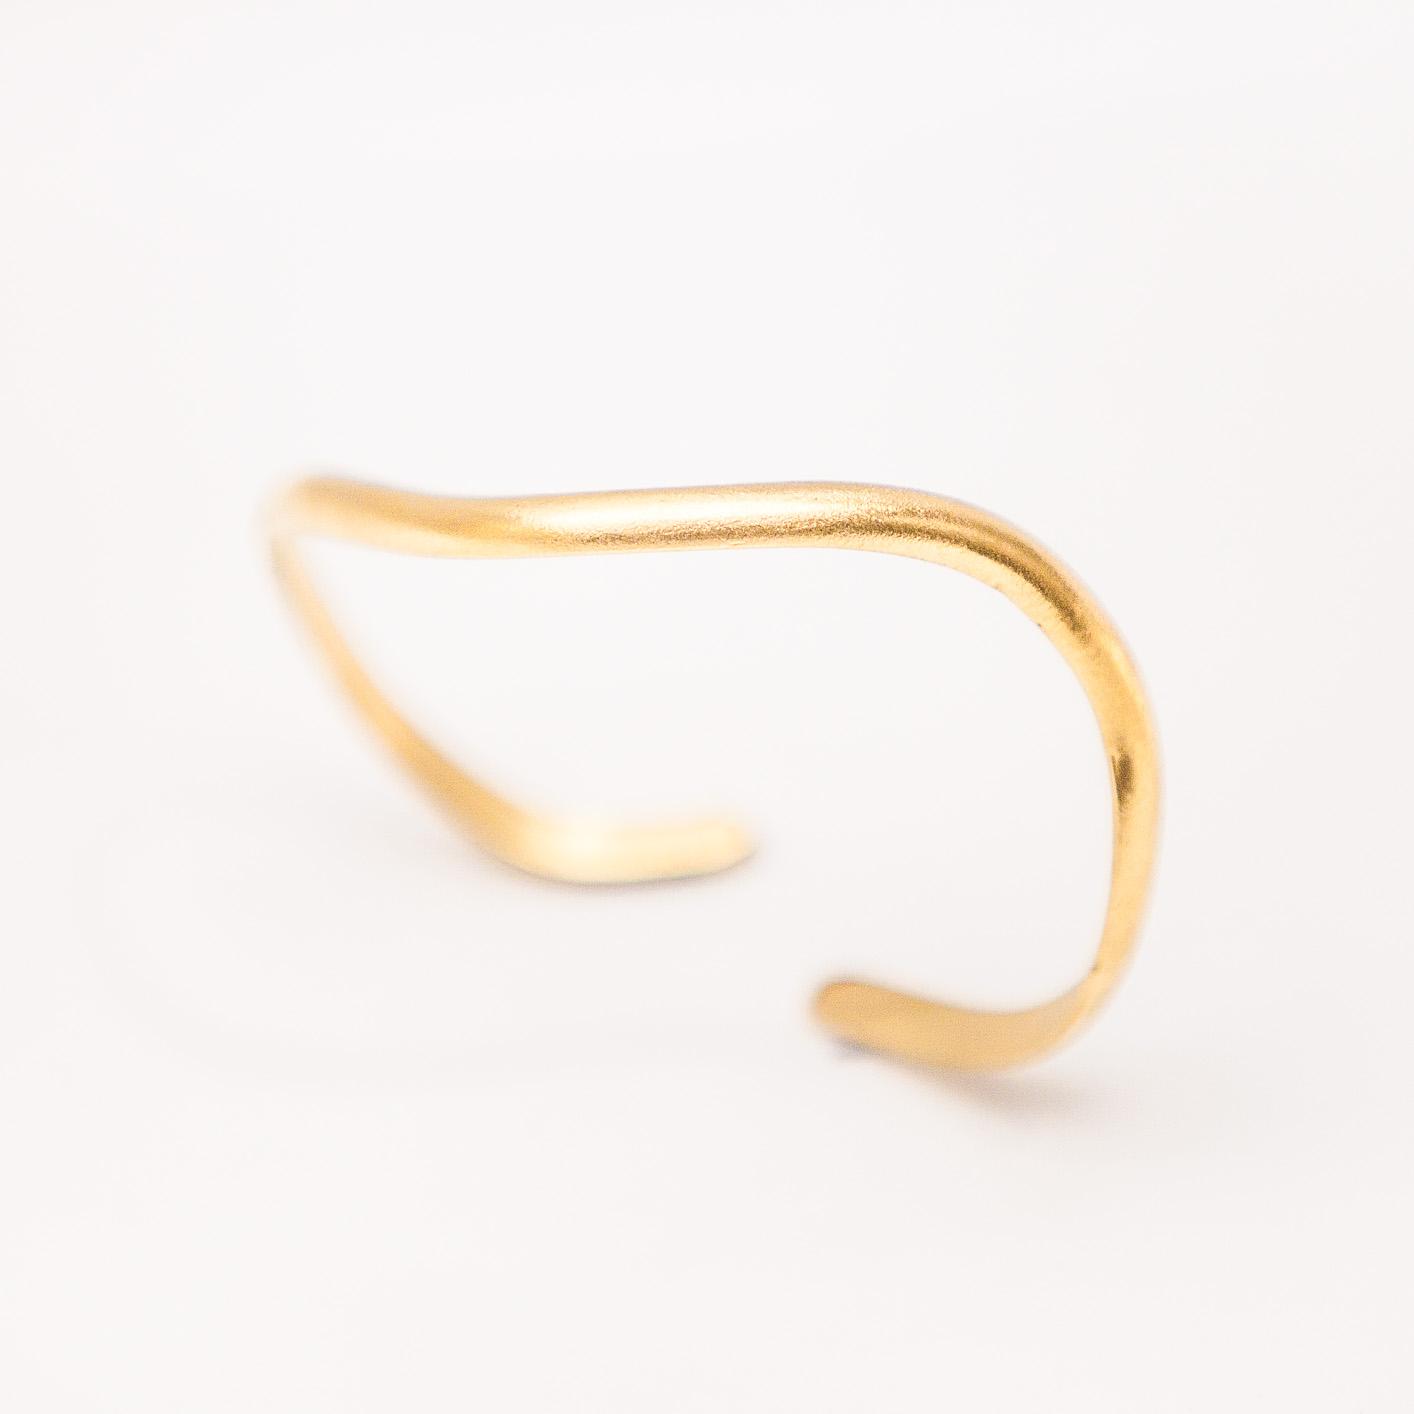 Minimal ElegantGreek Handmade Wrist Bangle, cuff bracelet